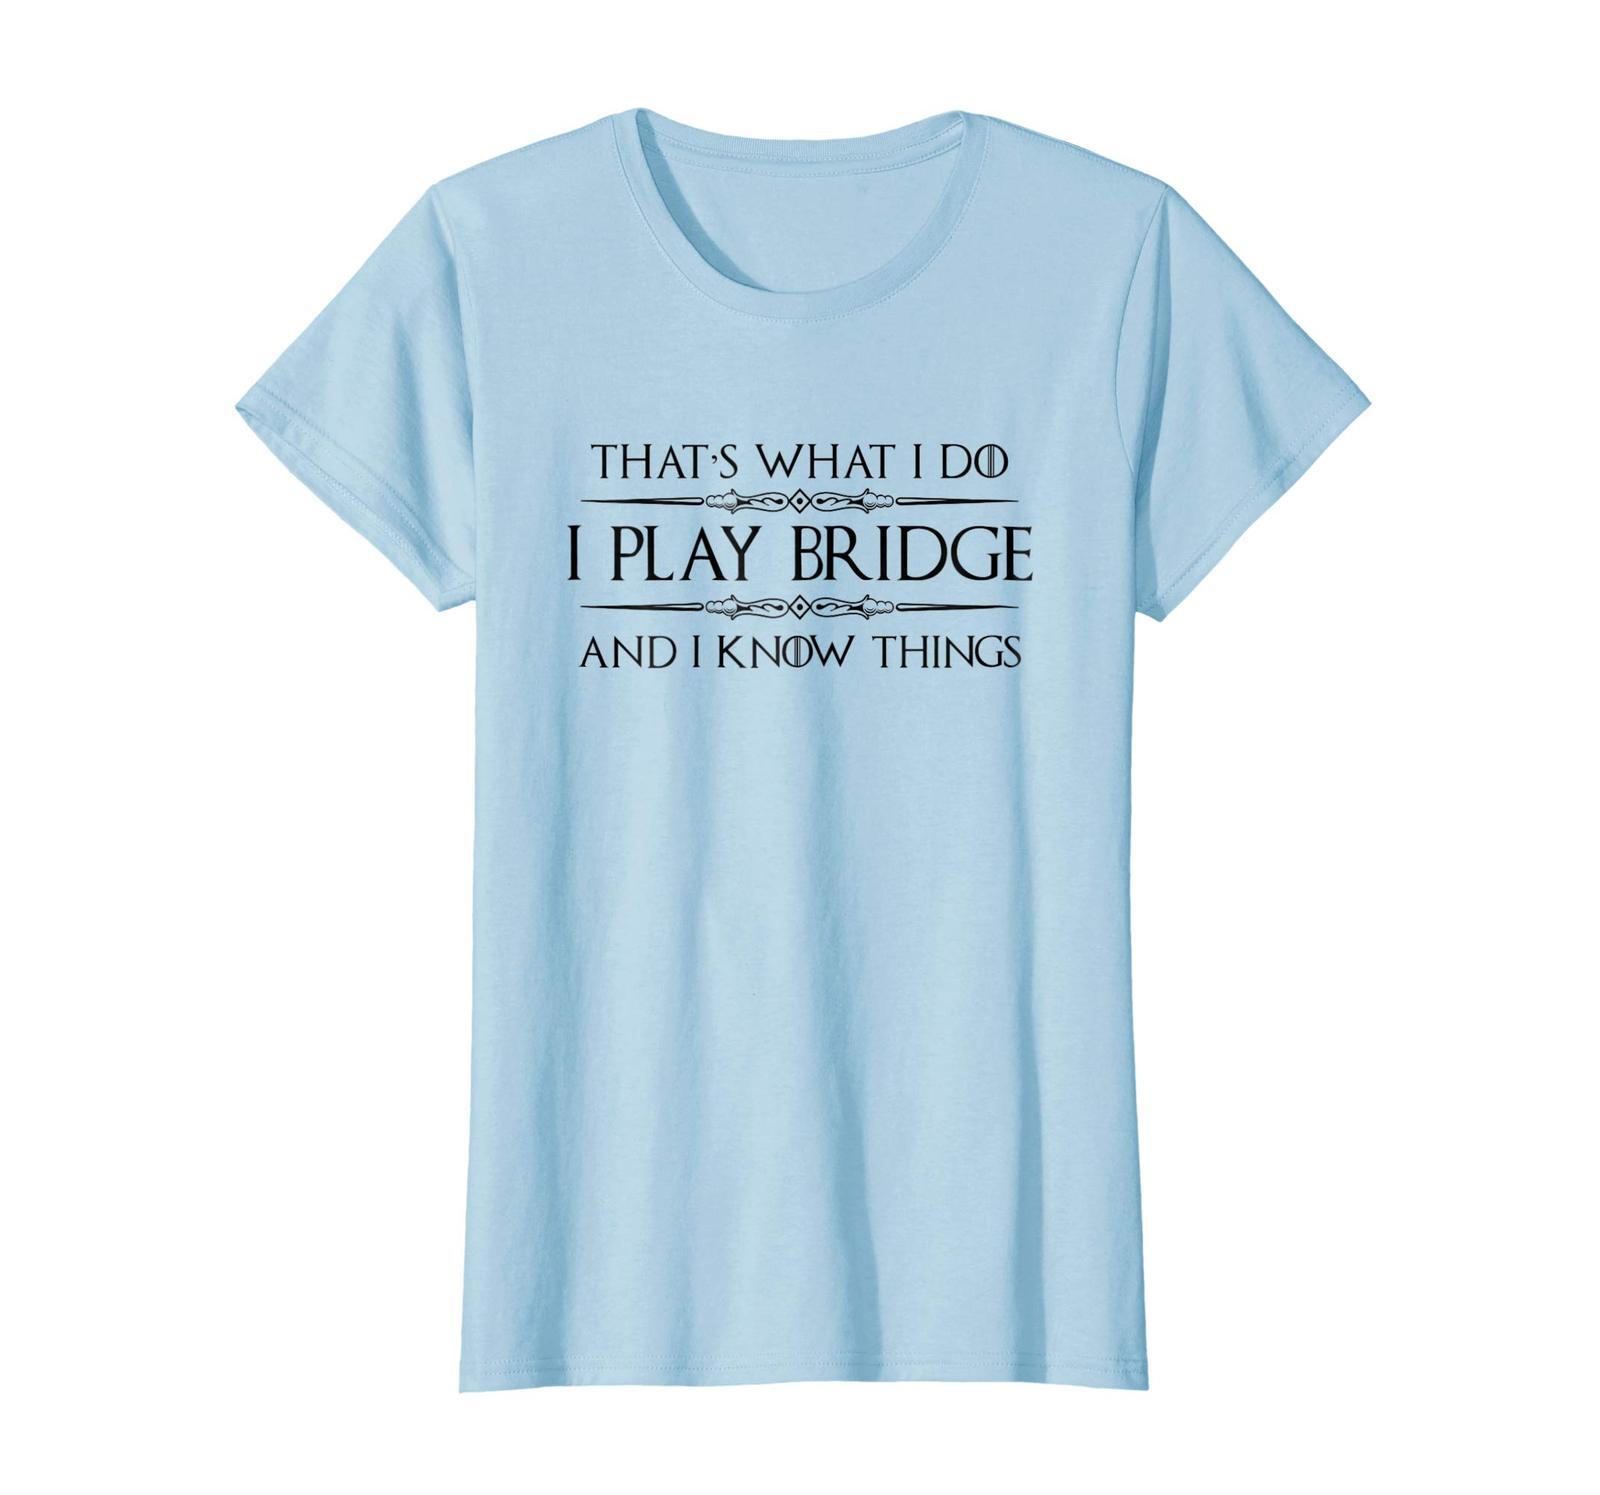 Funny TeeBridge Player Gifts - I Play Bridge & I Know Things Shirt Wowen